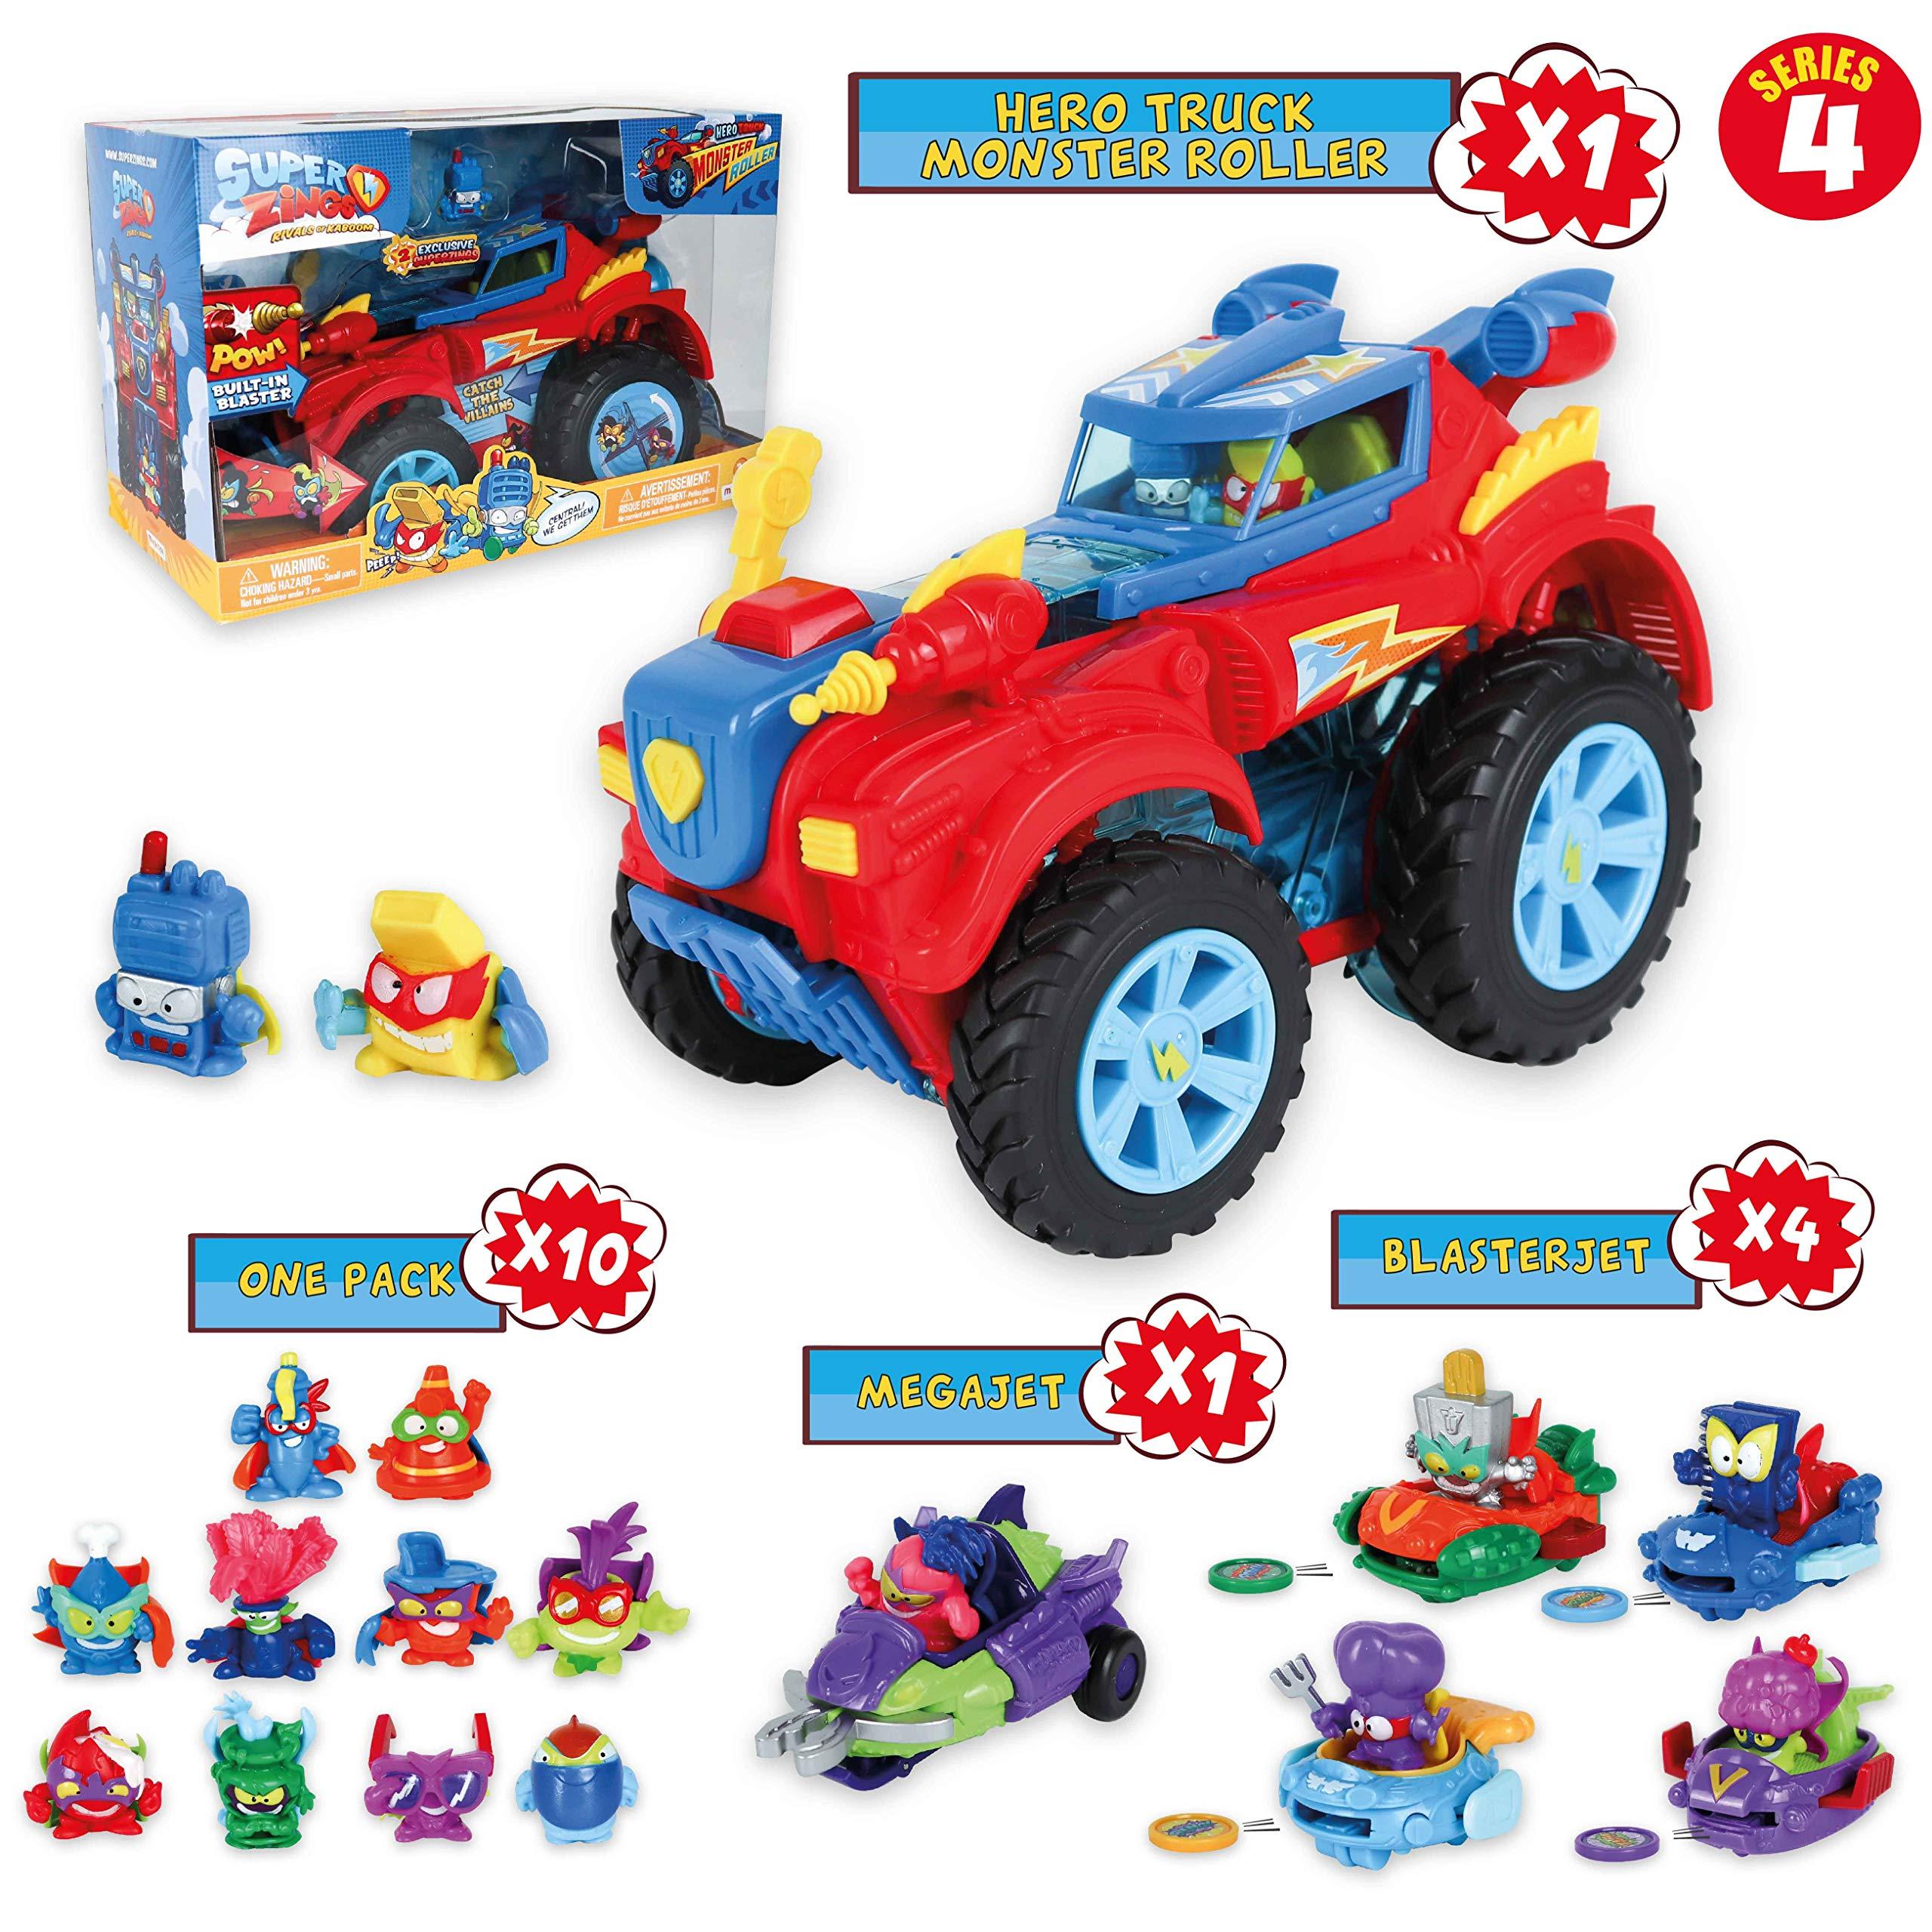 SuperZings Serie 5 – Hero Truck Monster Roller y Pack Sorpresa con 16 Sets | Contiene Juguete Monster Roller, 10 Sobres One Pack, 4 Aerowagons y 2 Skyracers | Juguetes y Regalos para Niños (Serie 4)